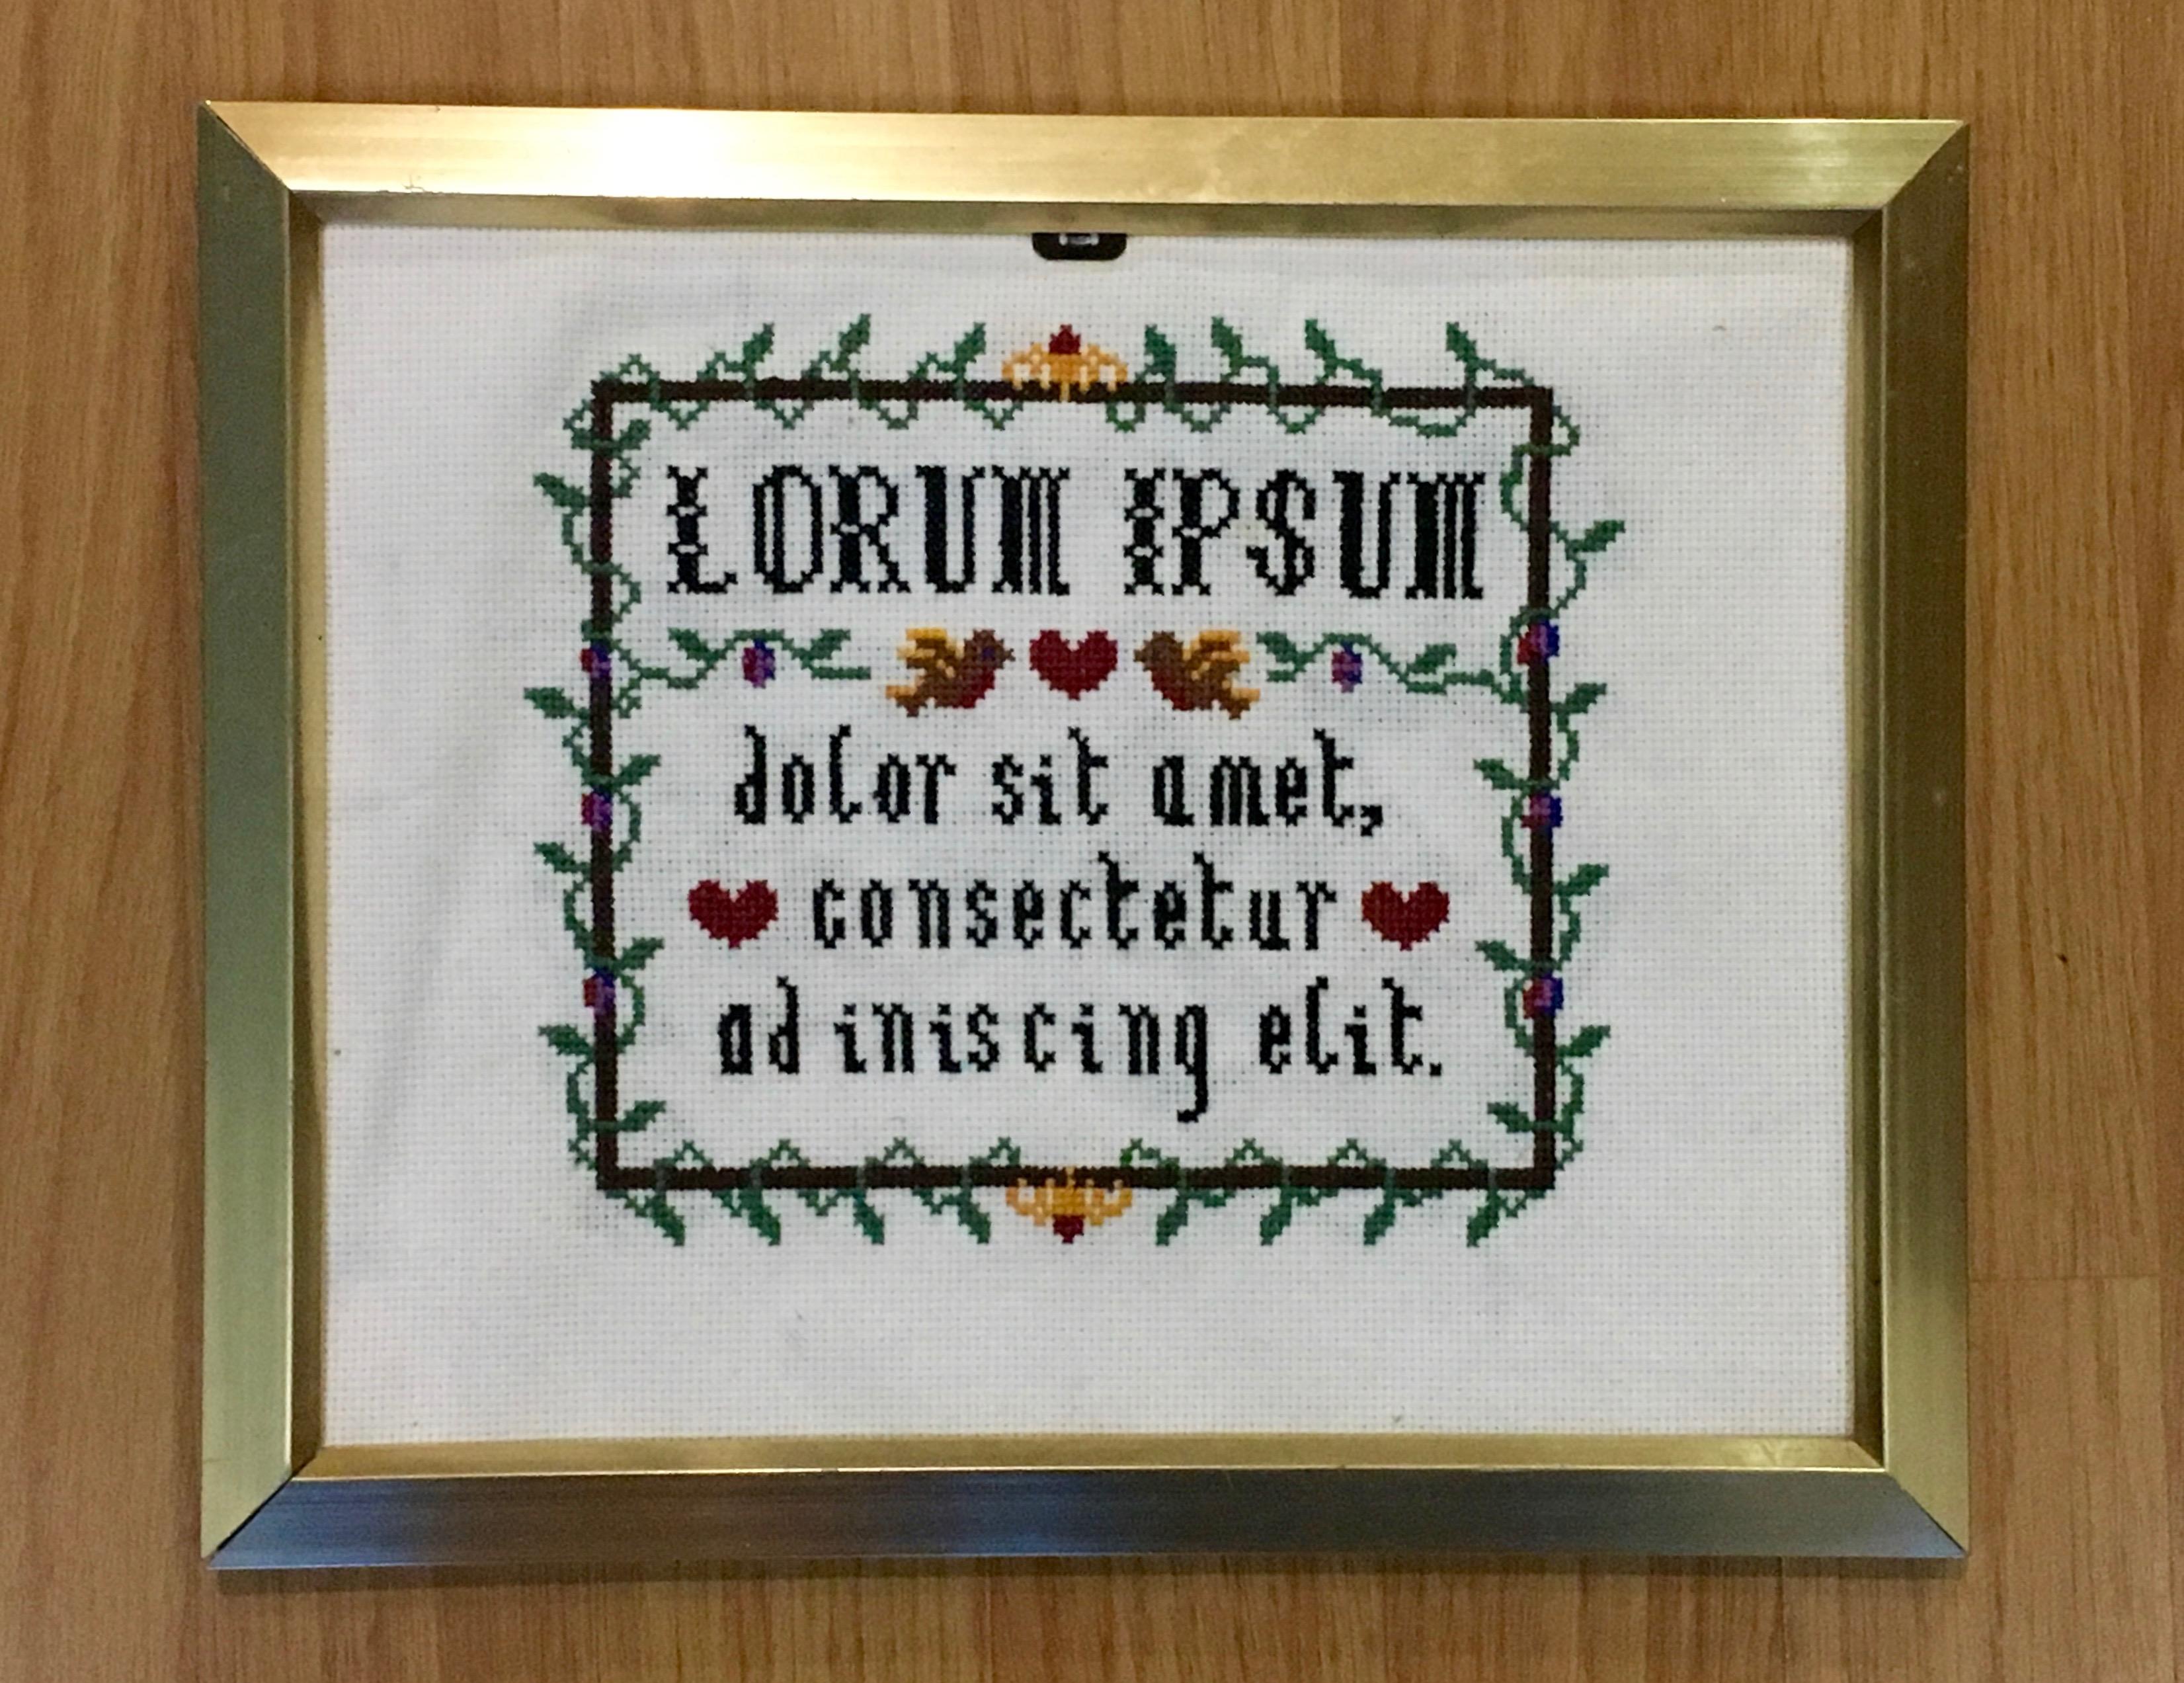 Lorum ipsum cross stitch sampler